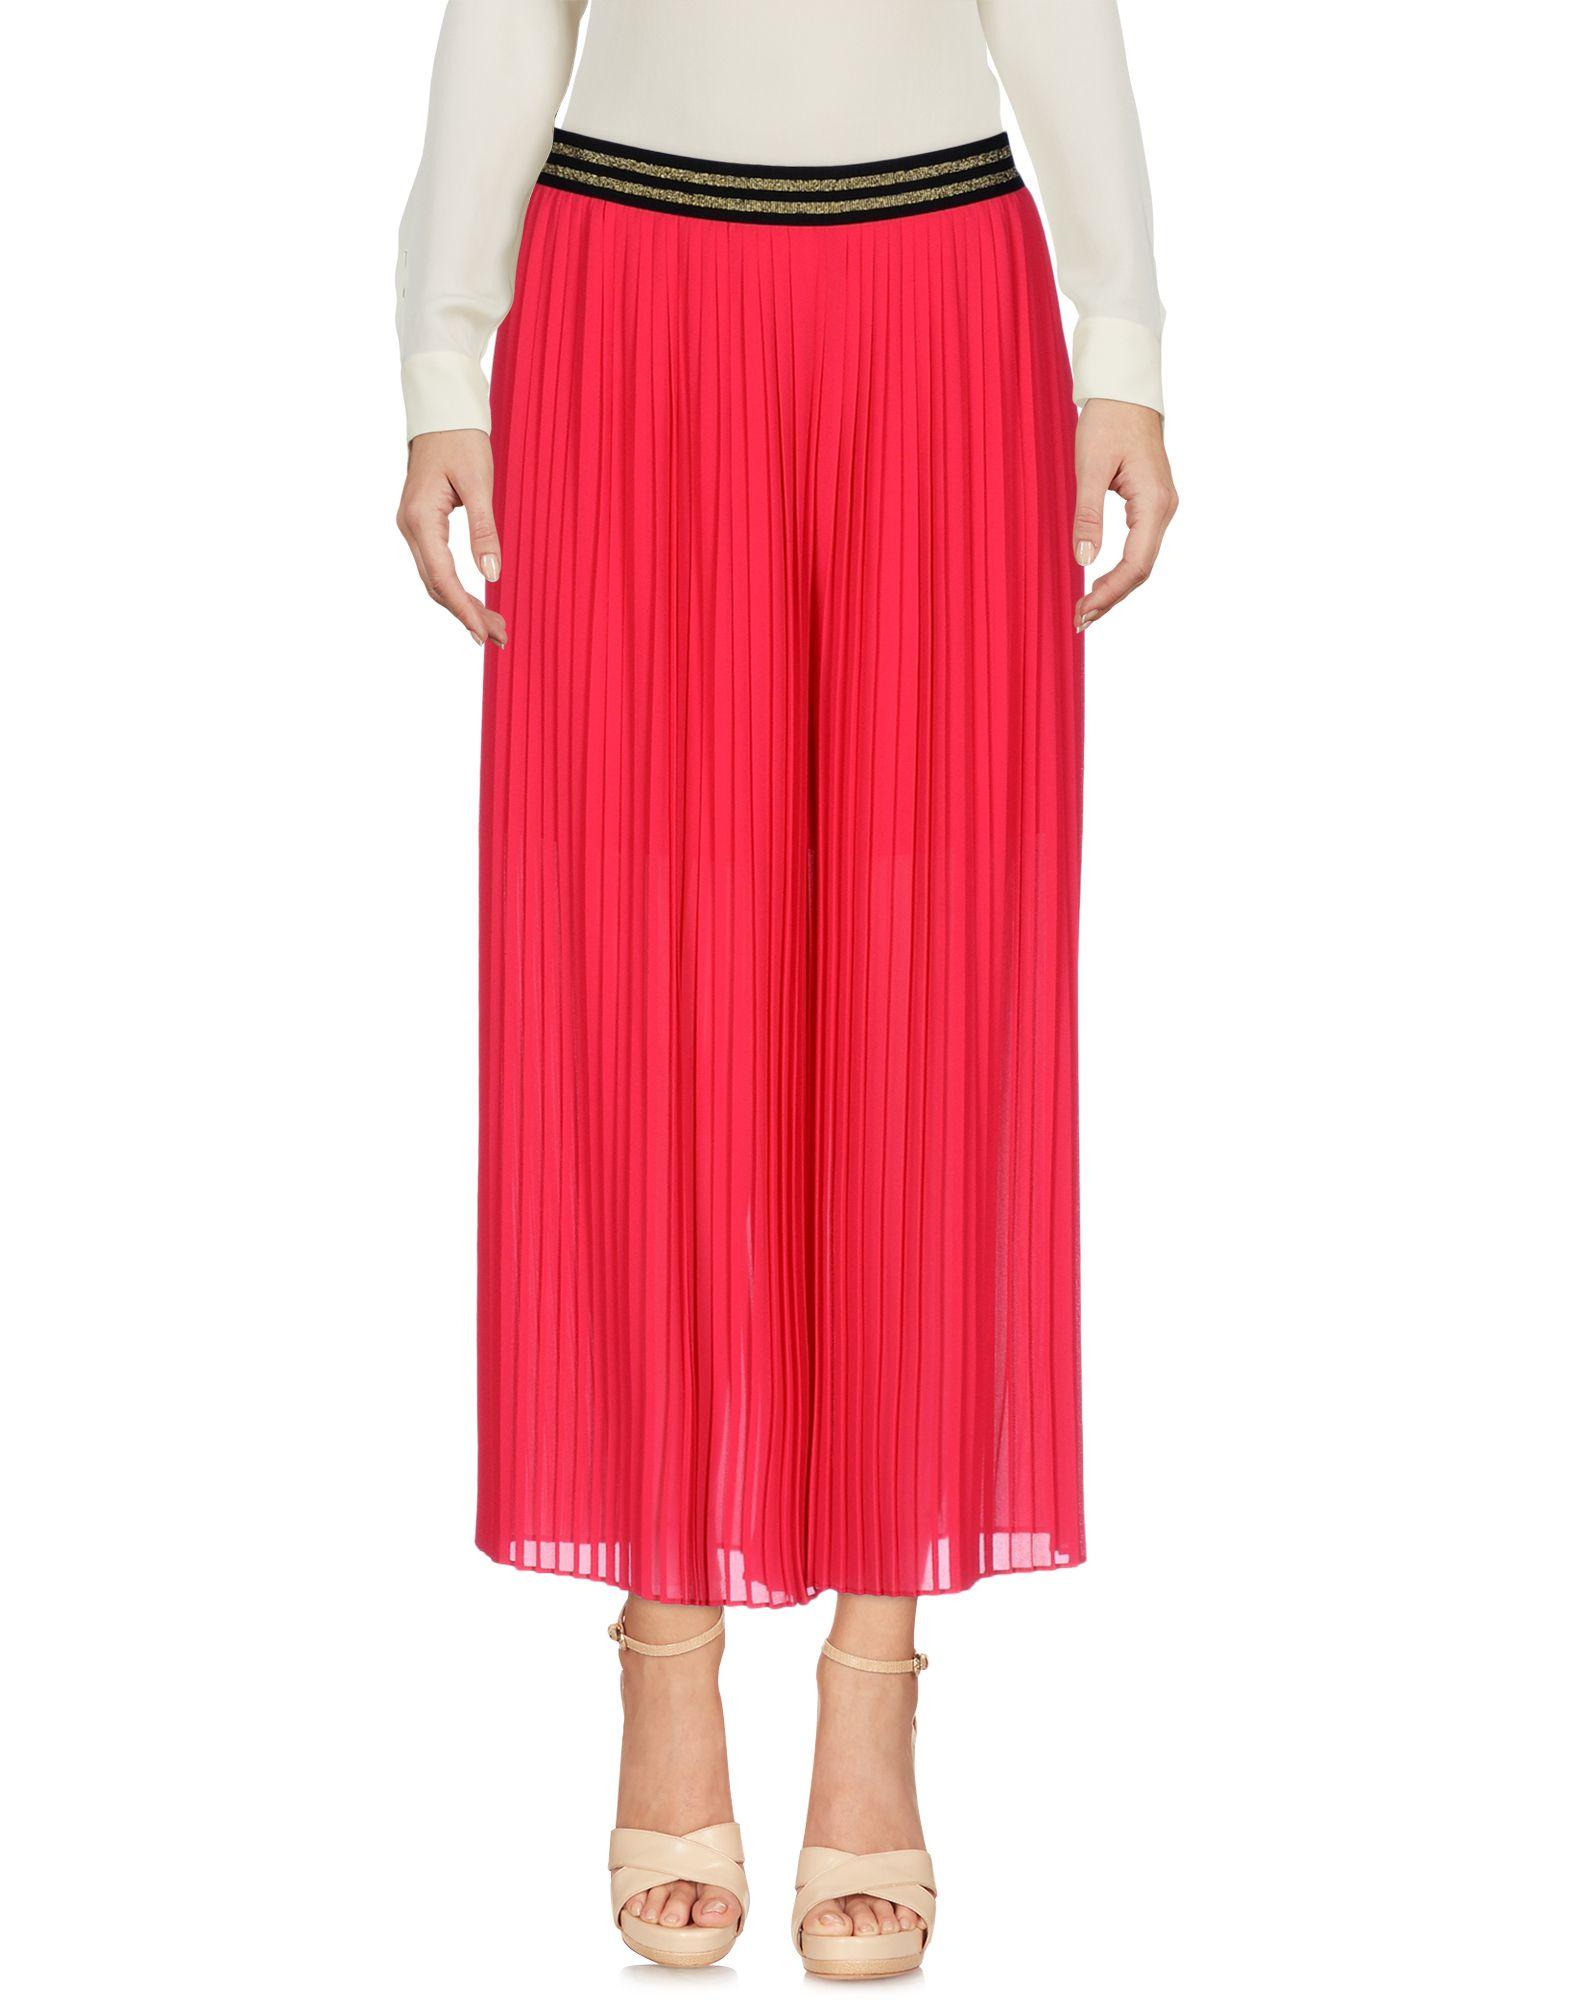 AMNÈ Юбка длиной 3/4 zimmermann юбка длиной 3 4